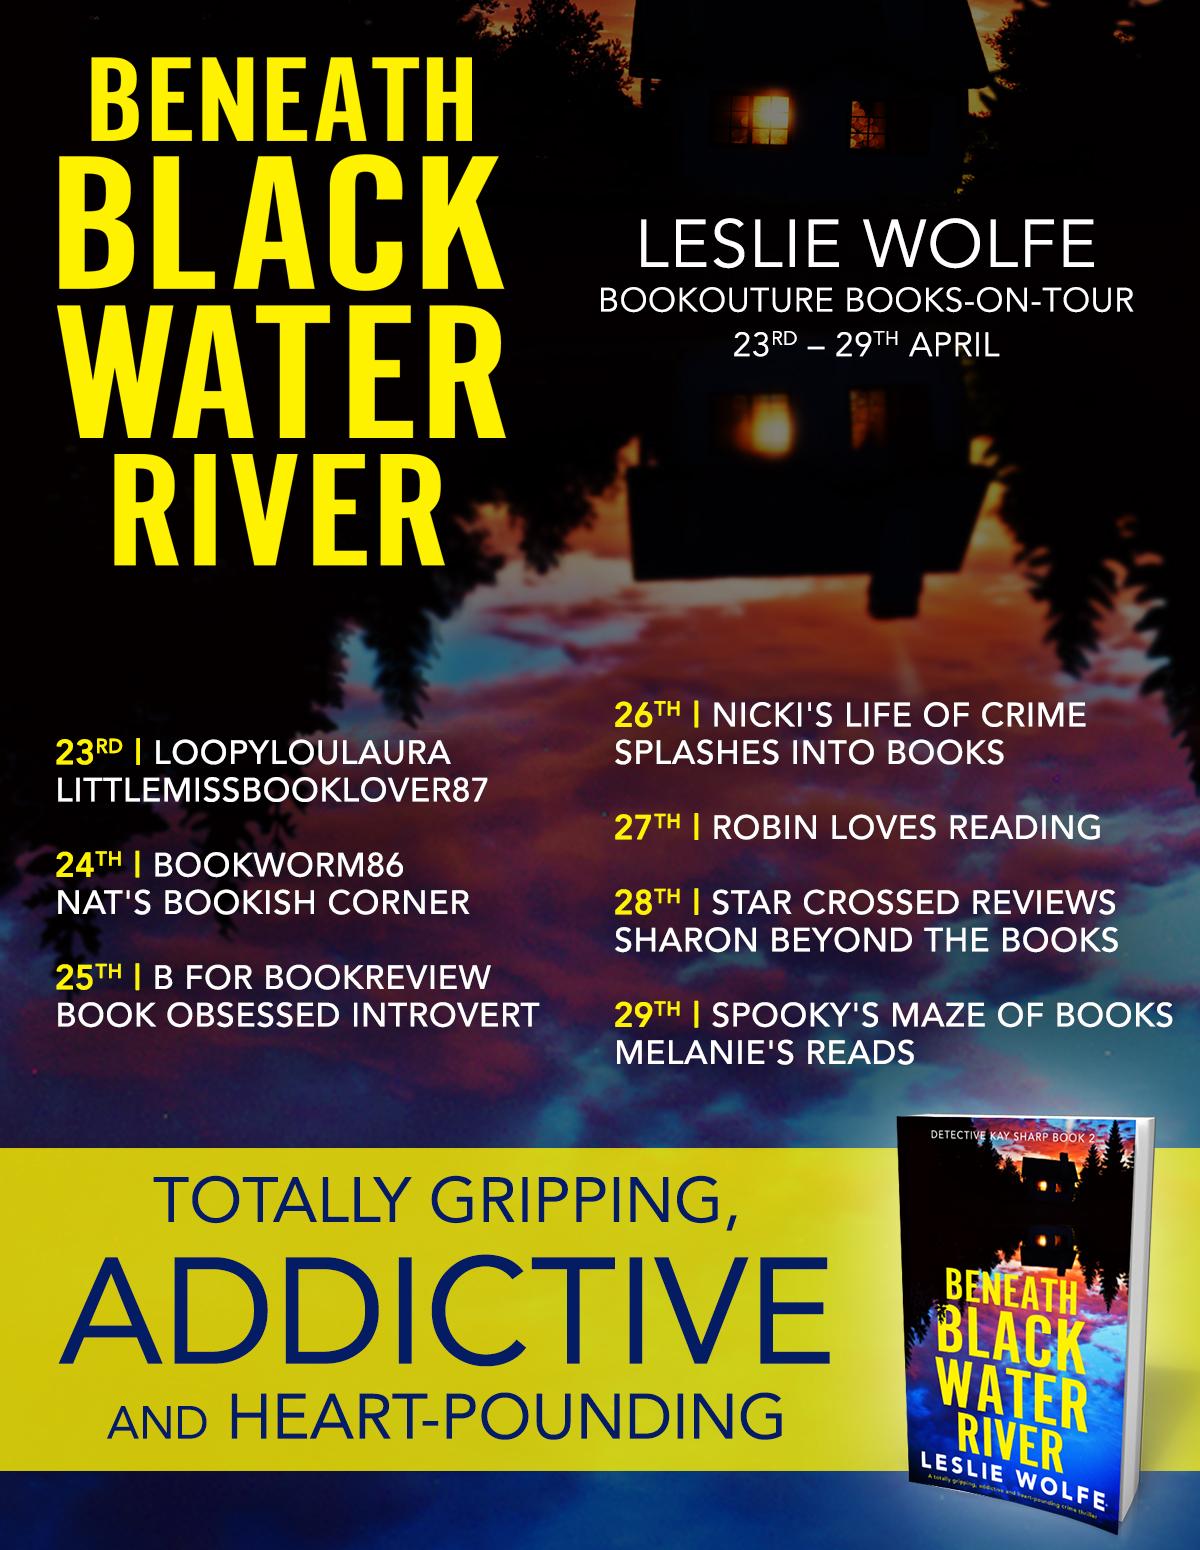 Blog Tour Review: Beneath Blackwater River